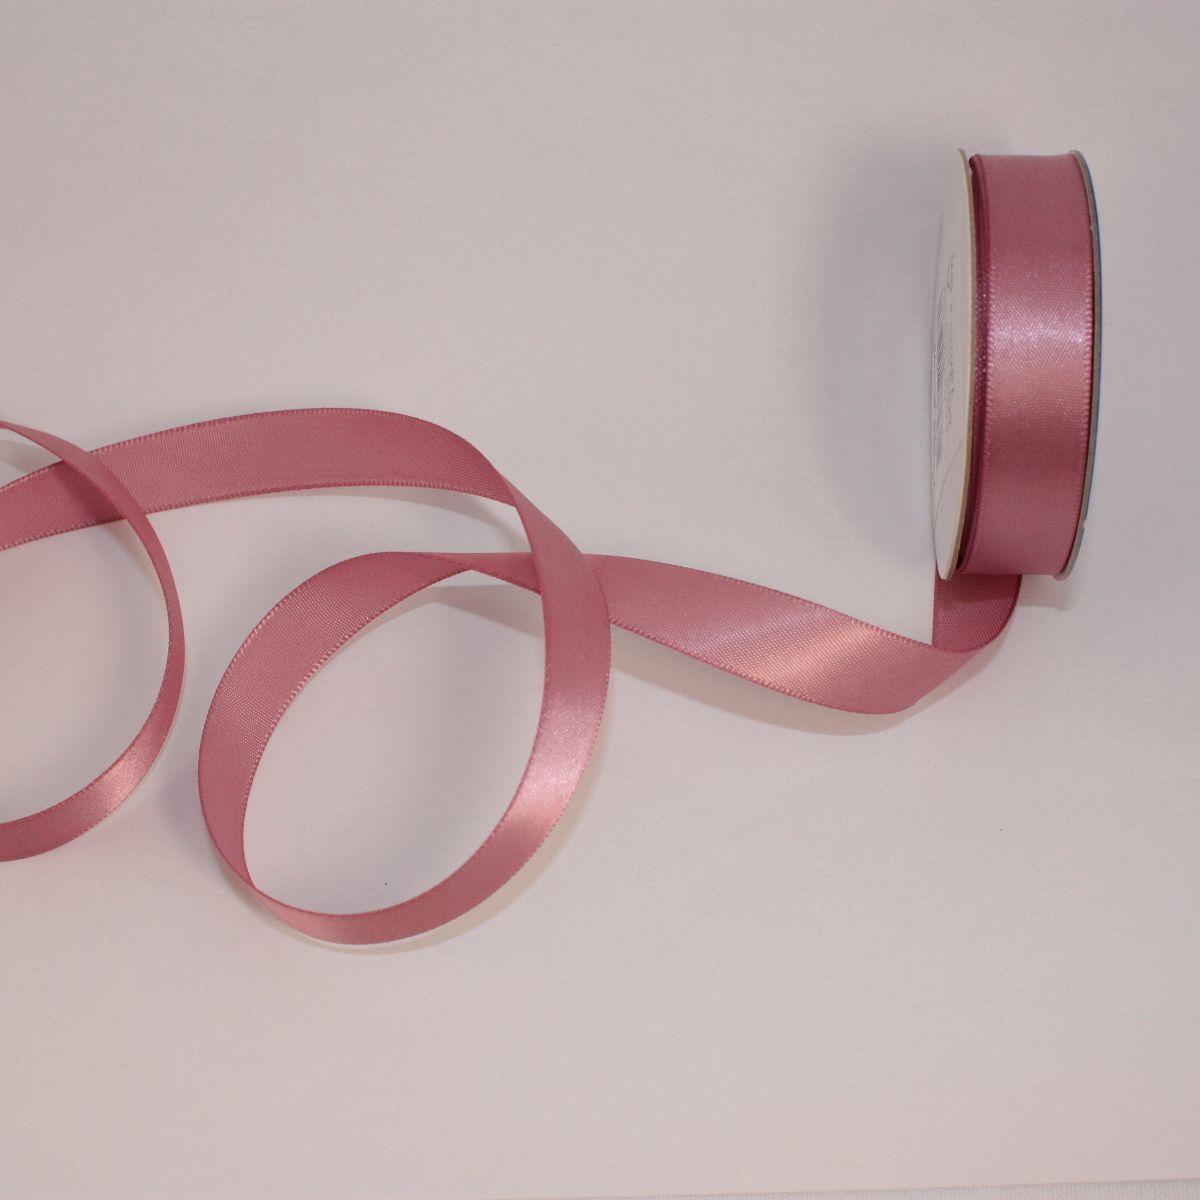 Ruban satin en bobine rose balais 13 mm